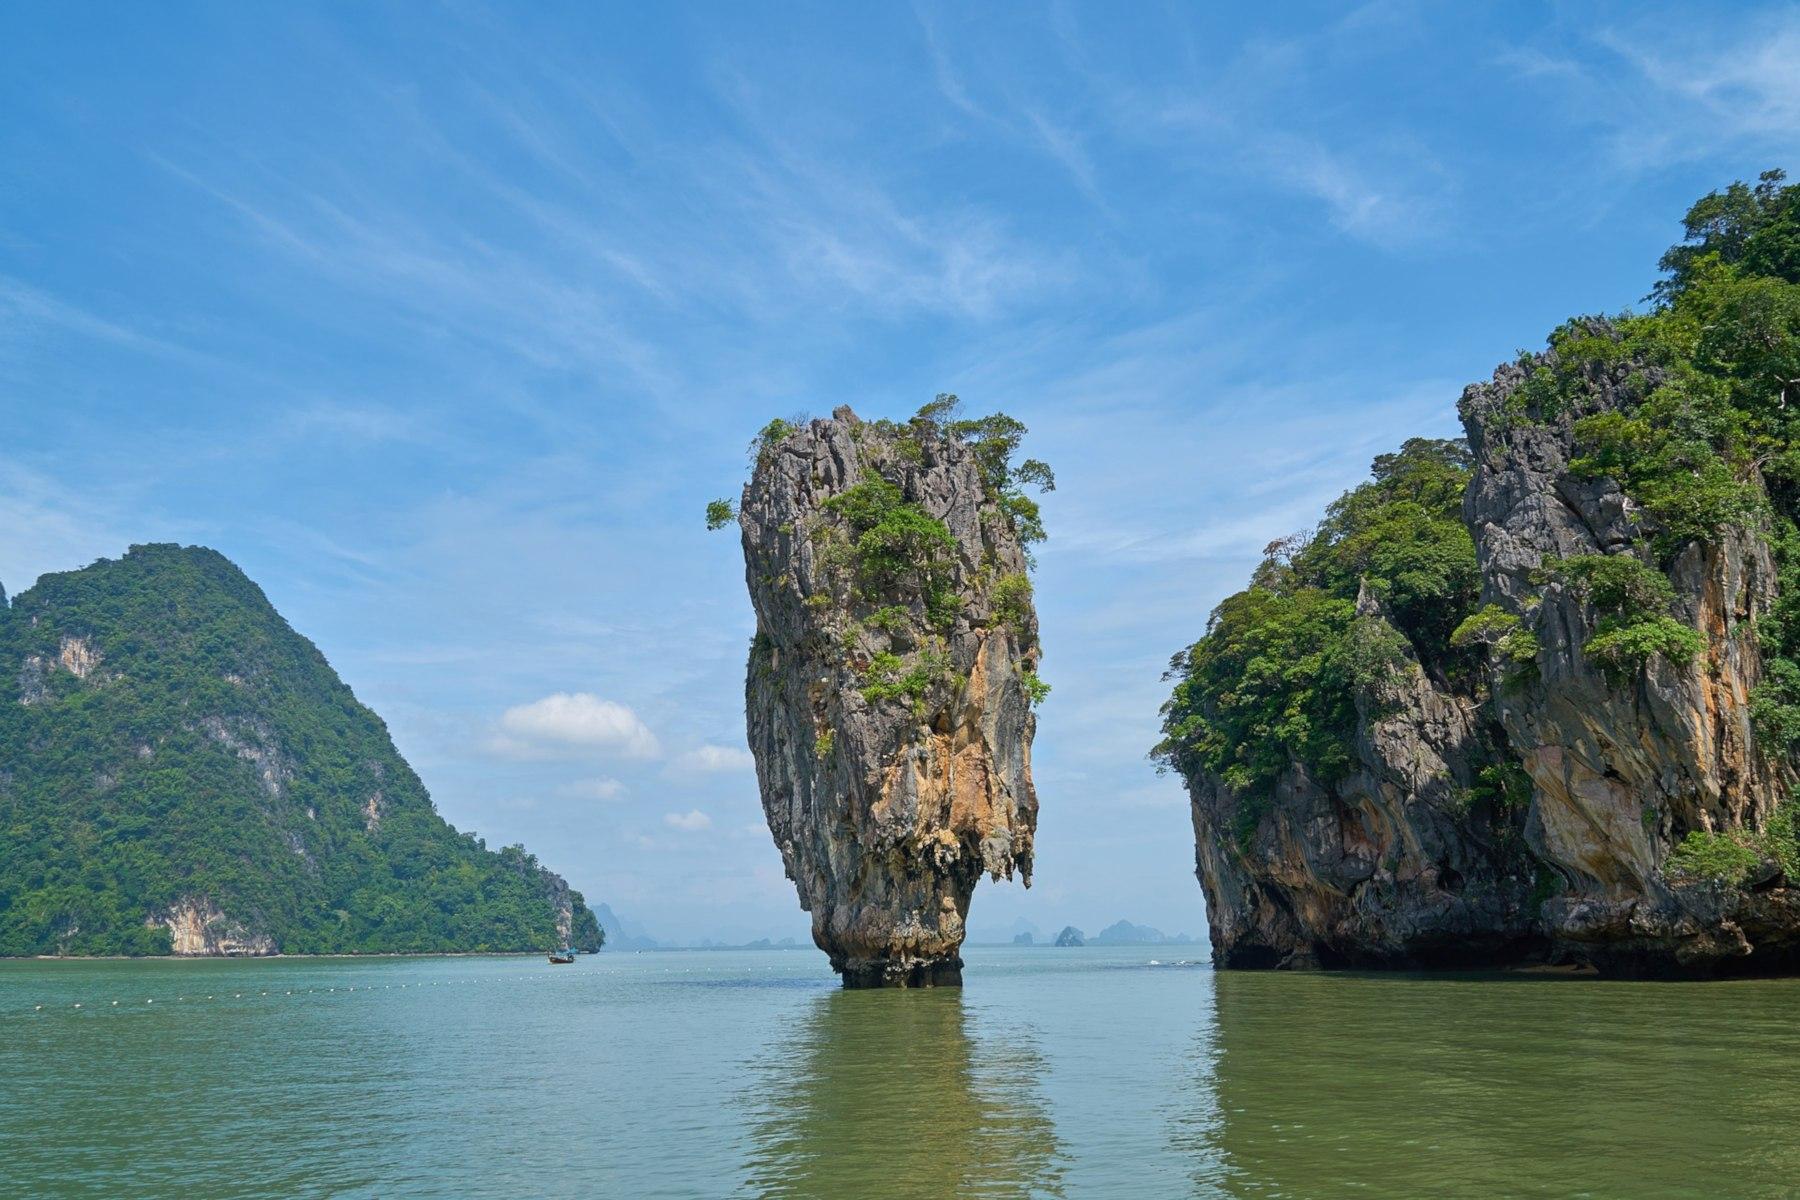 Die Insel Khao Phing Kan in der Bucht von Phang-nga zählt mit ihrer berühmten Felsnadel Khao Ta-Pu zu den bekanntesten Motiven Thailands.